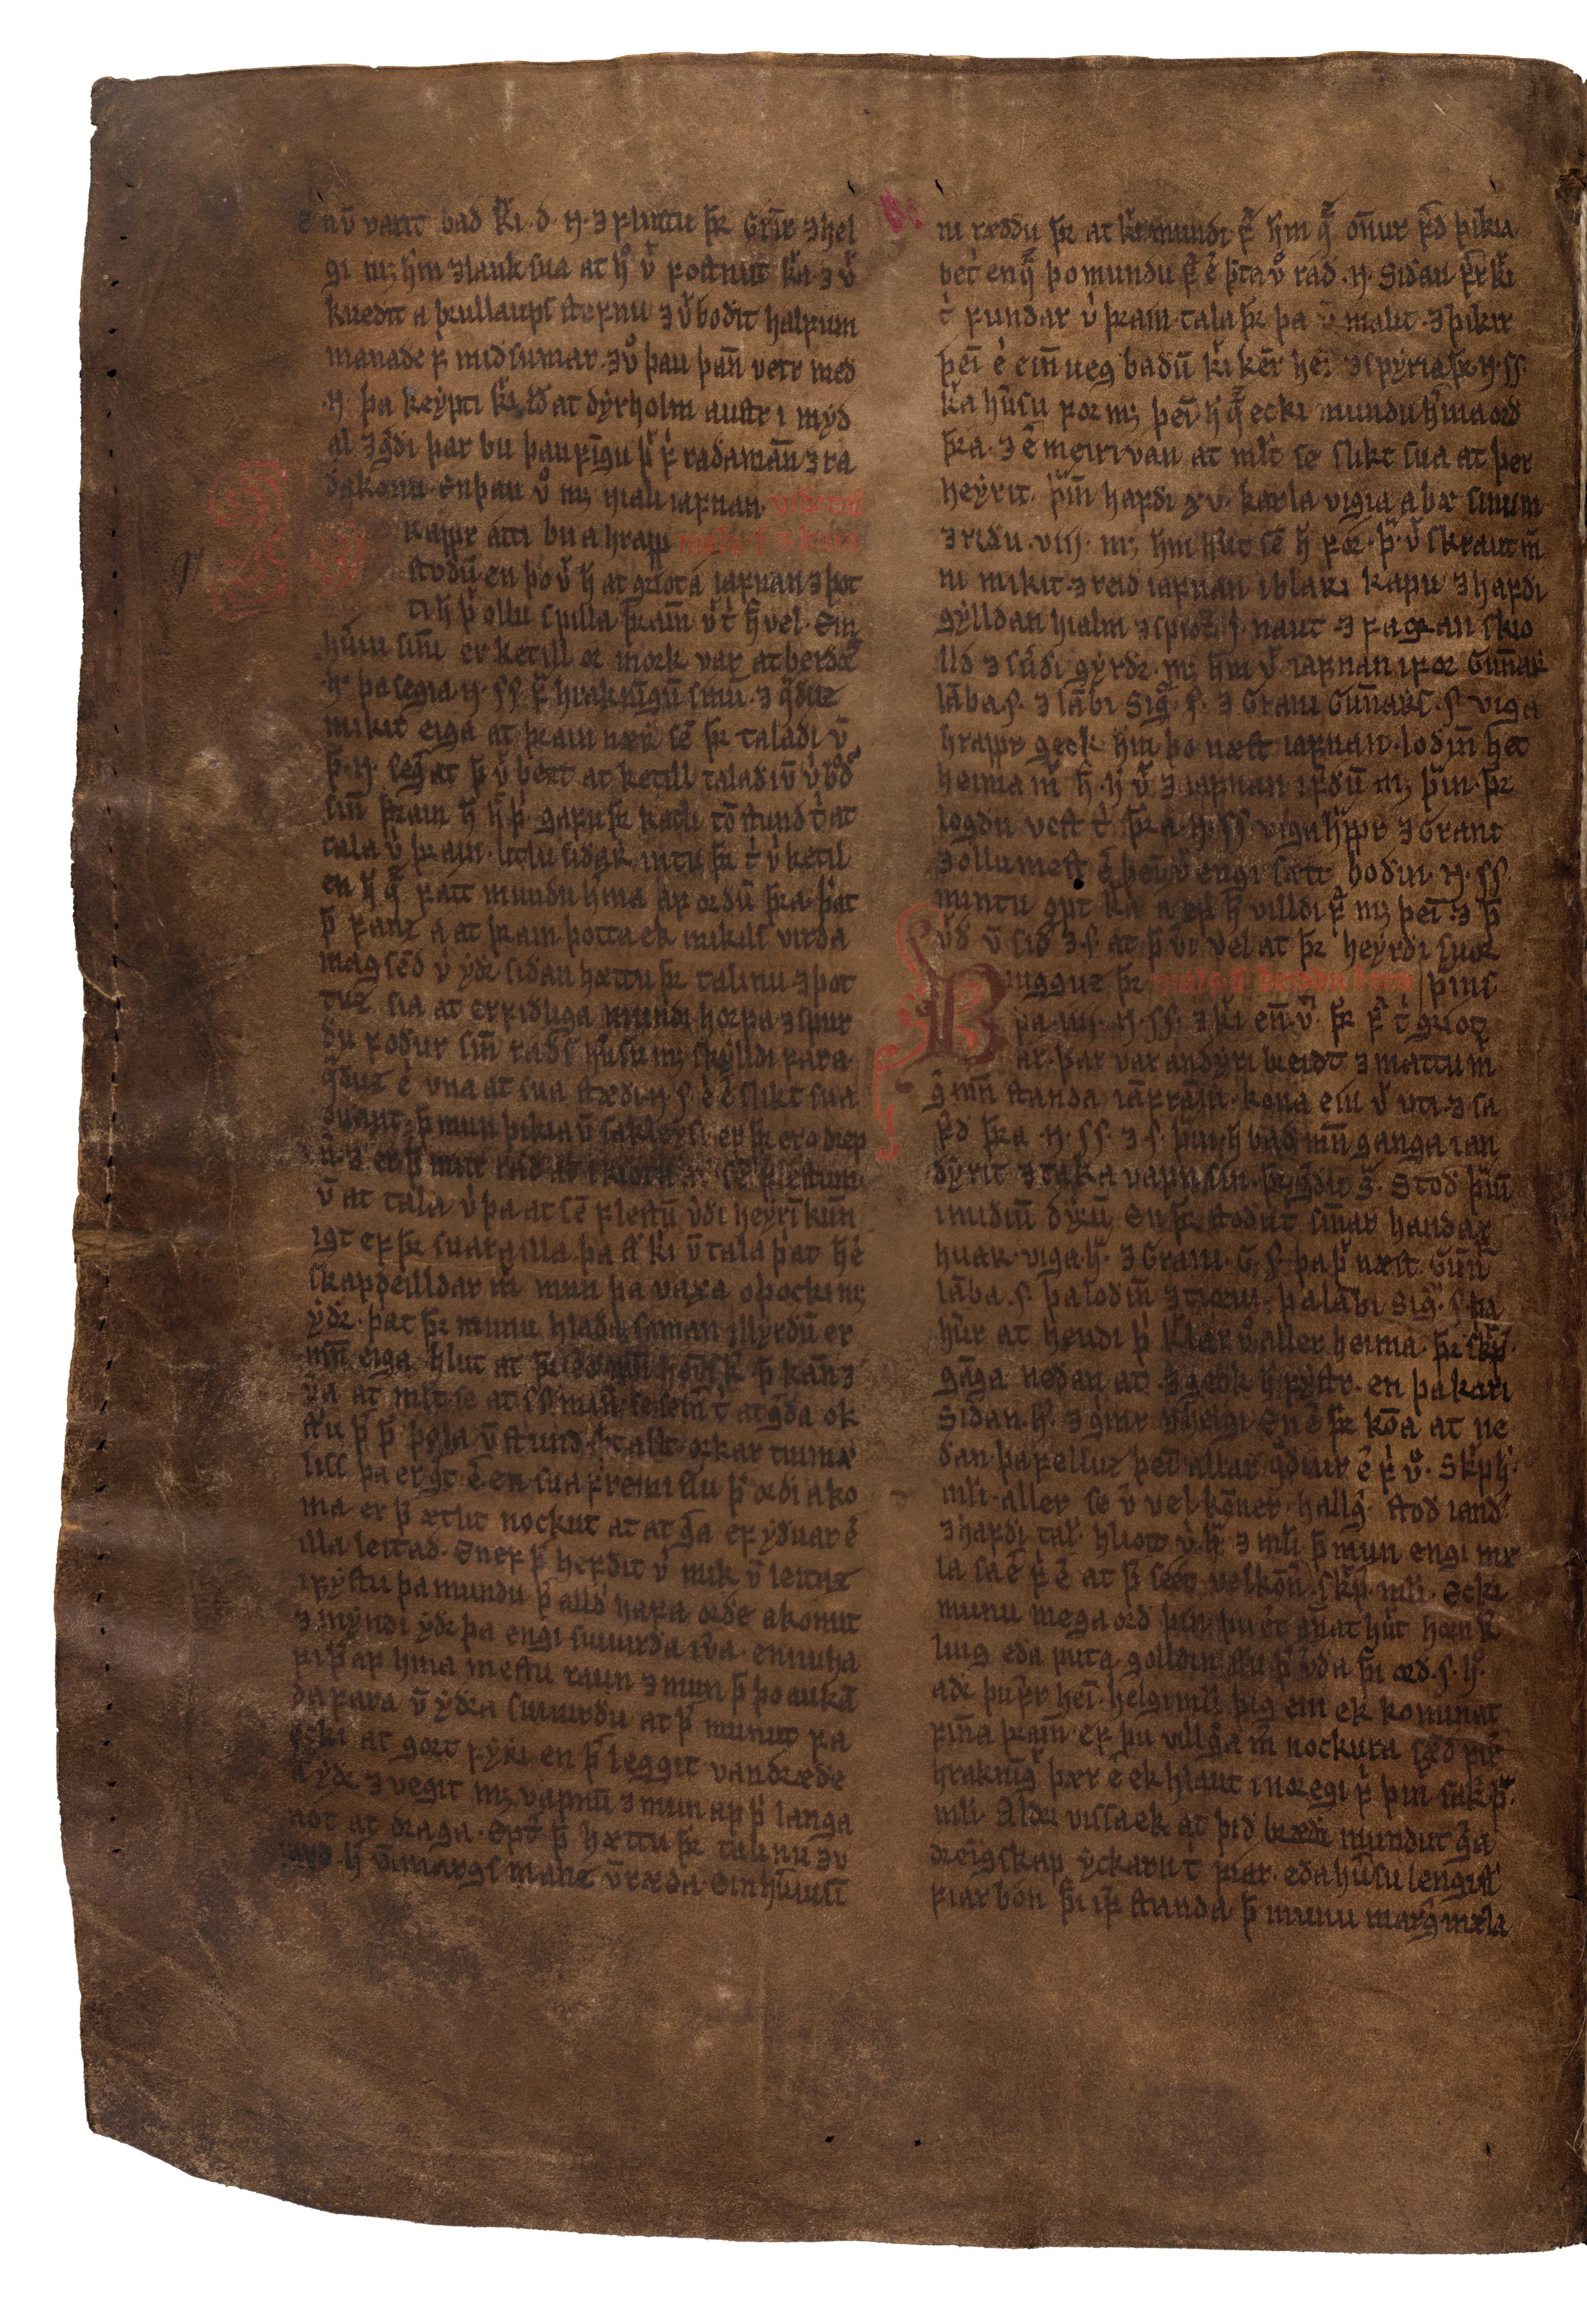 AM 132 fol - 33v